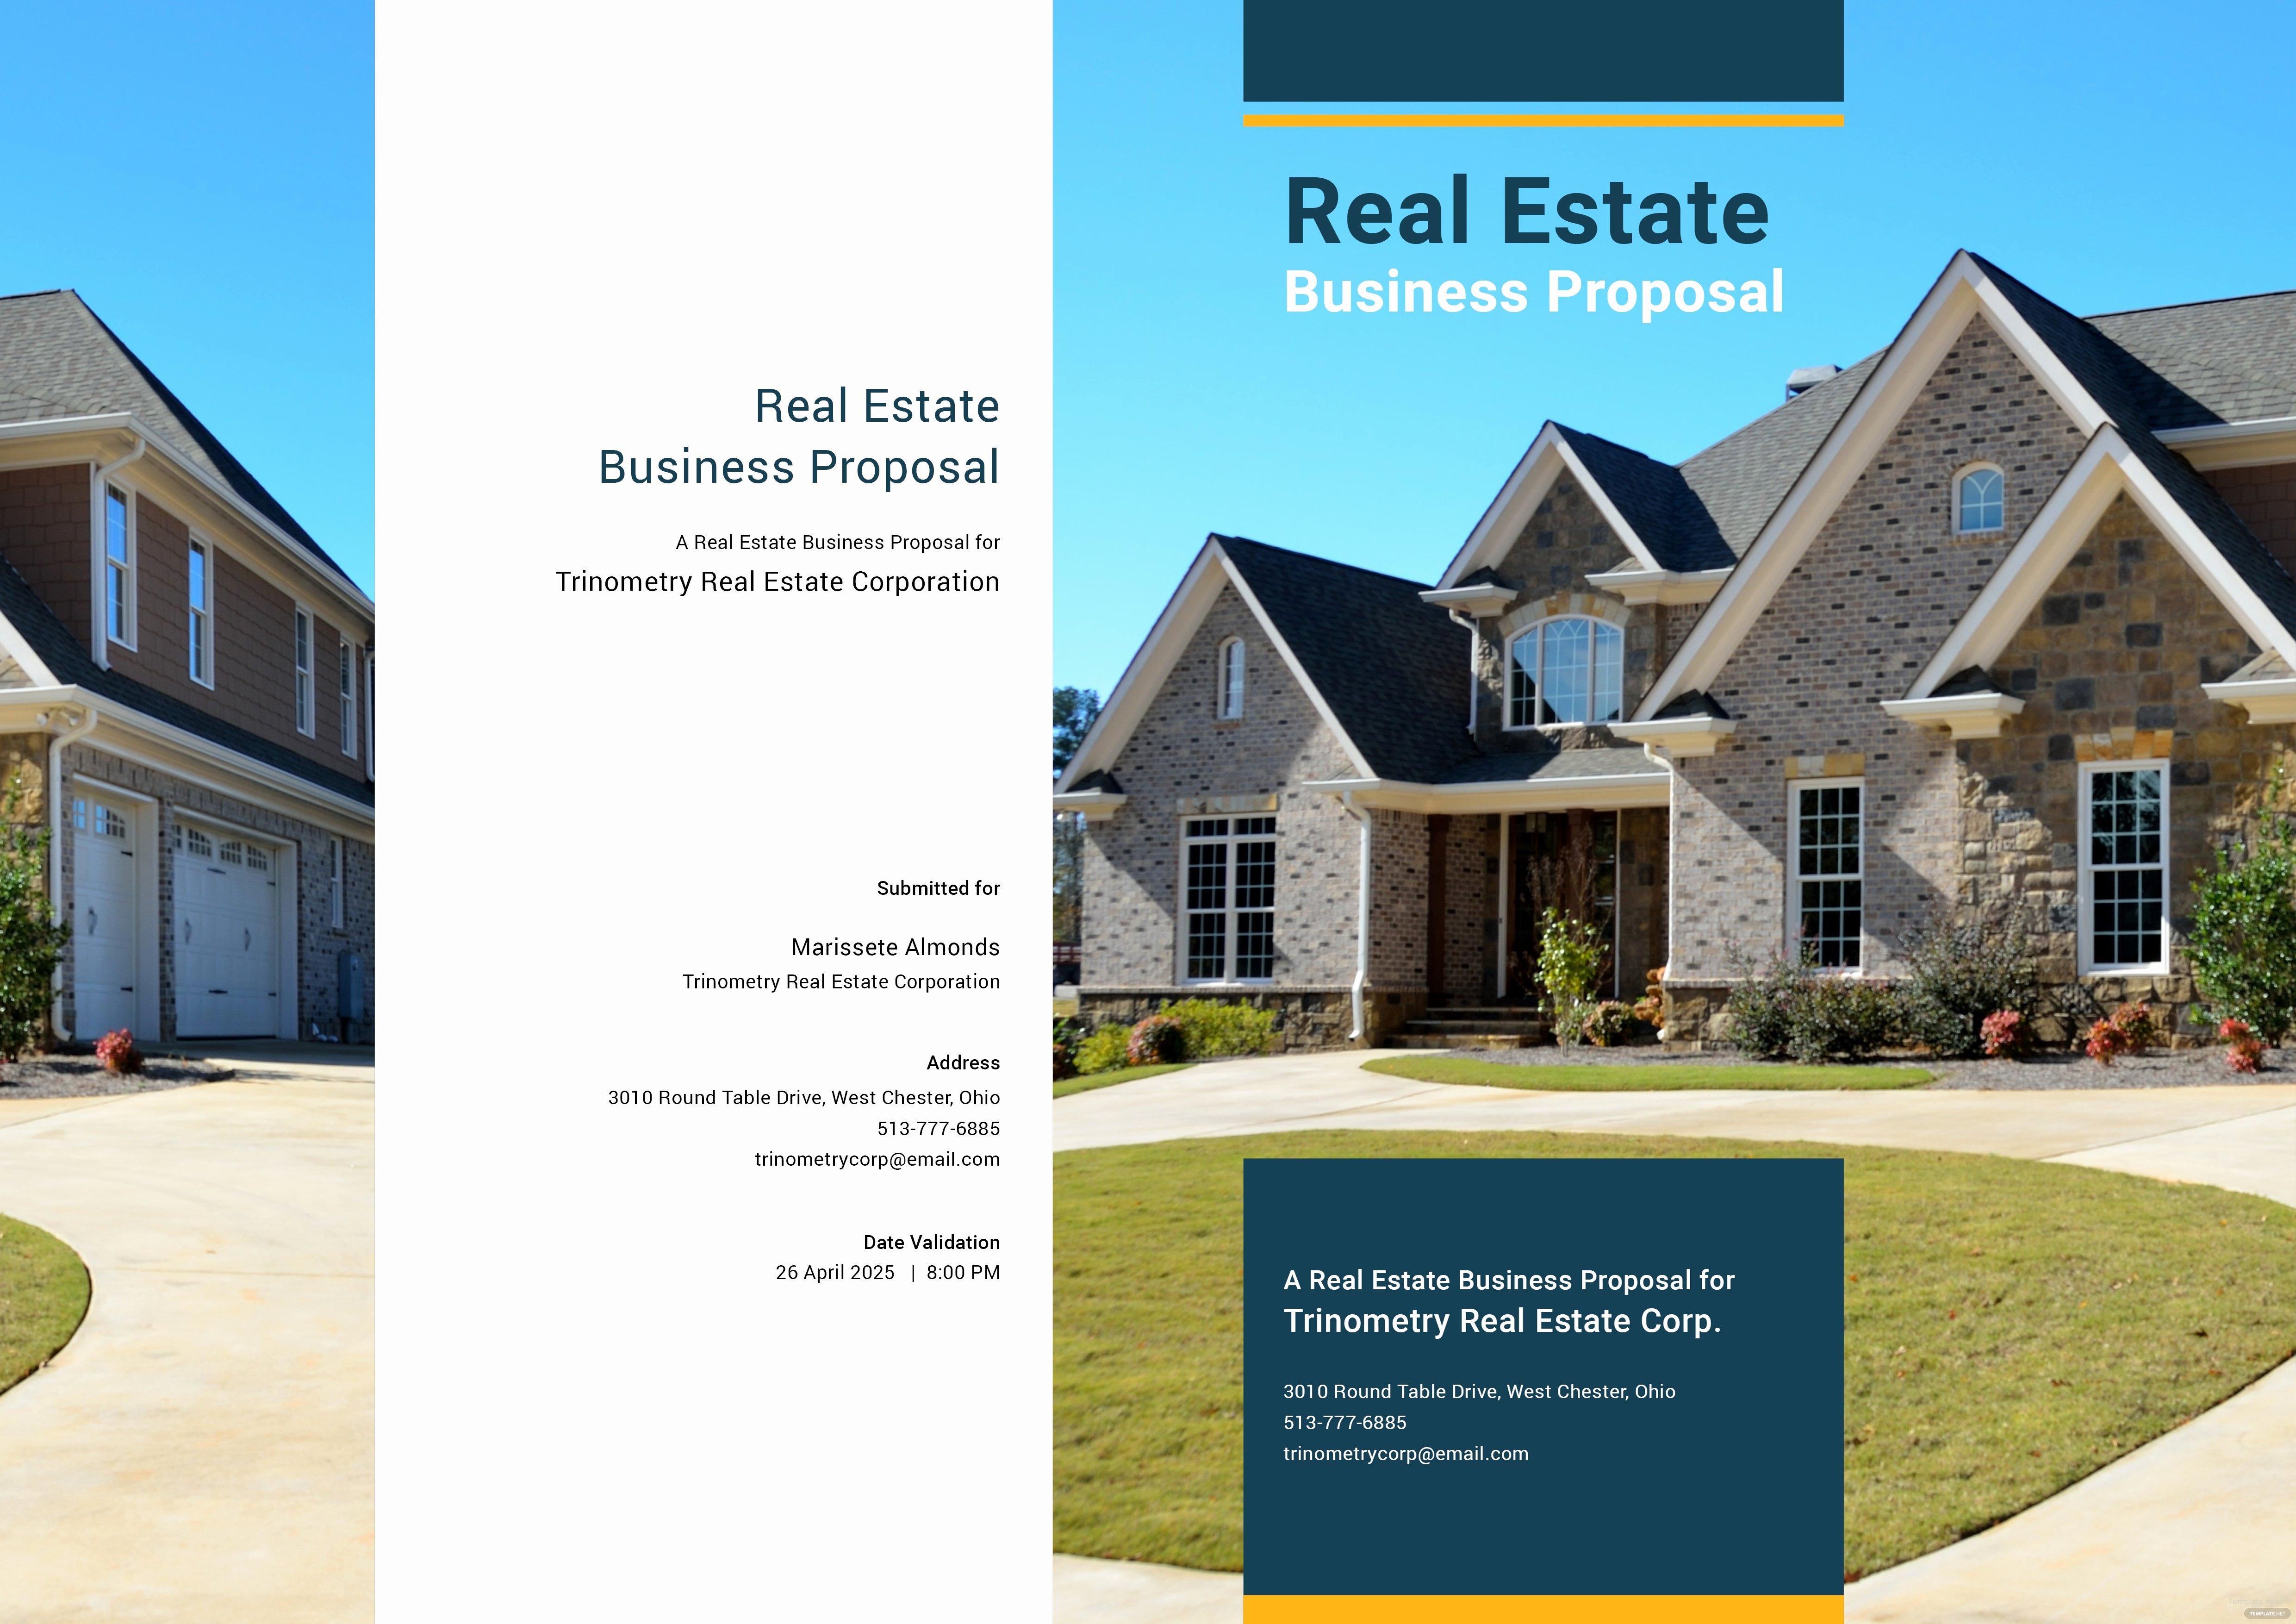 Real Estate Proposal Template Elegant Free Real Estate Business Proposal Template In Adobe